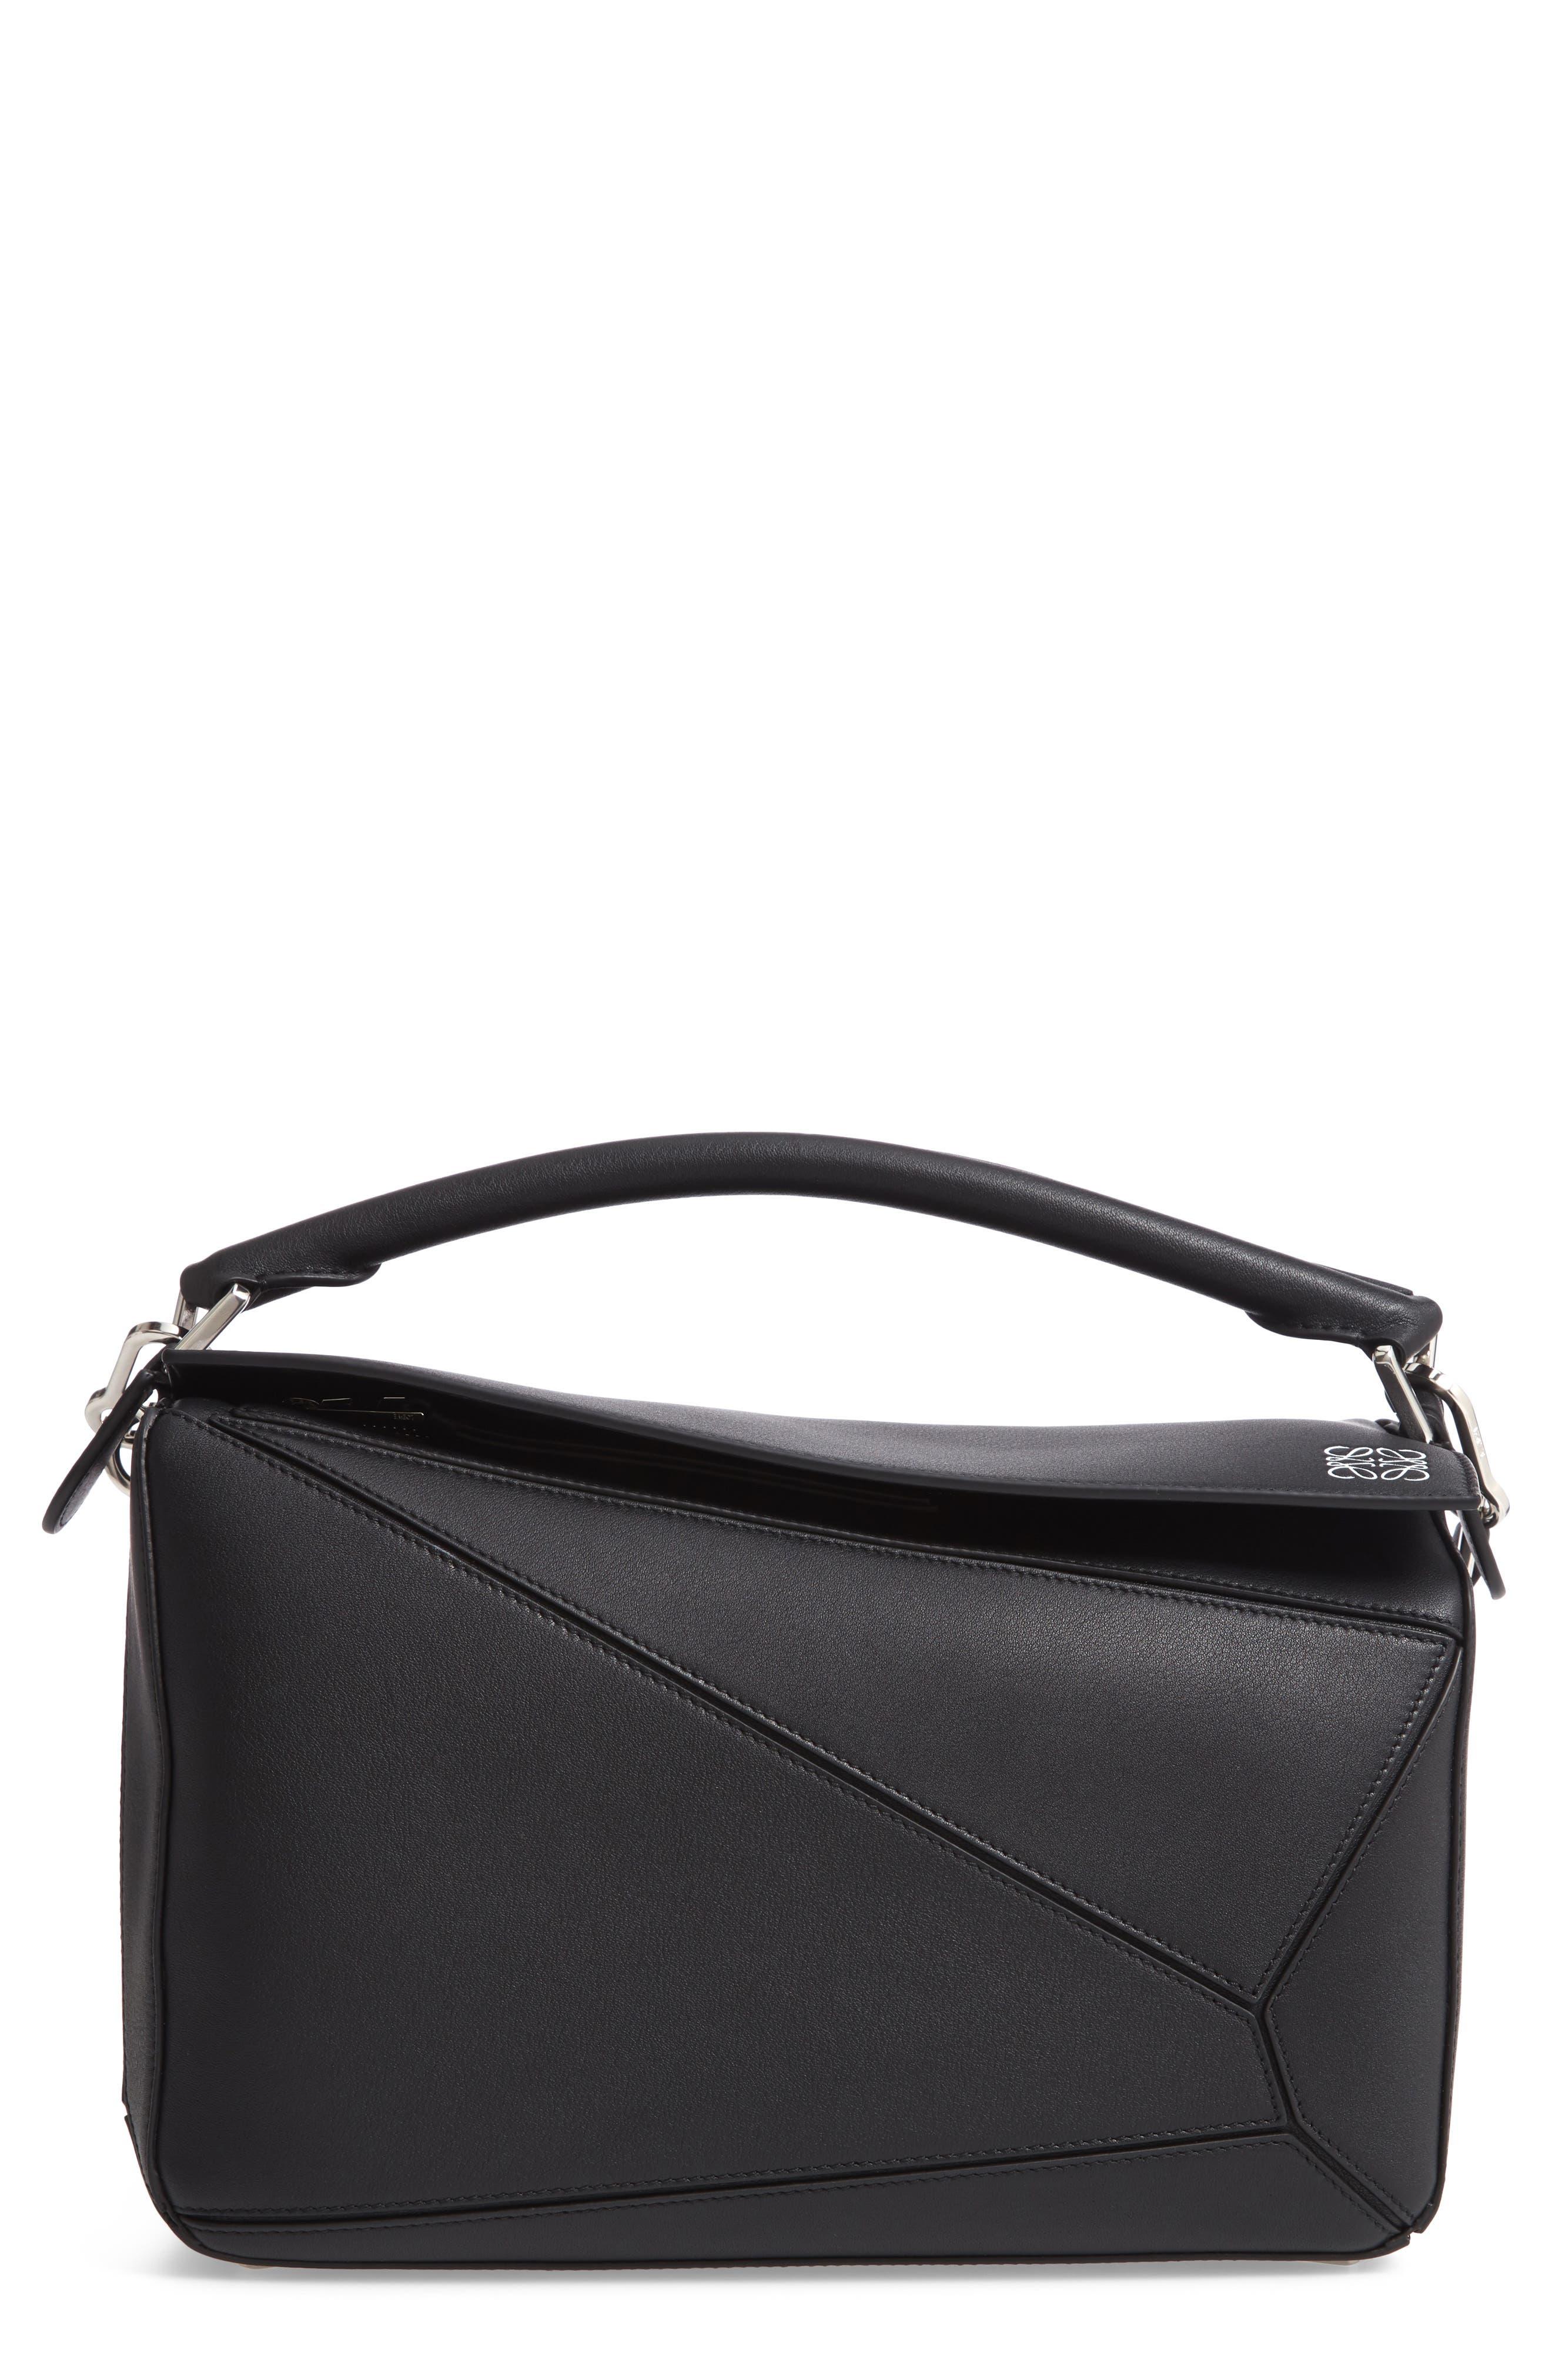 Medium Puzzle Bag,                             Main thumbnail 1, color,                             BLACK